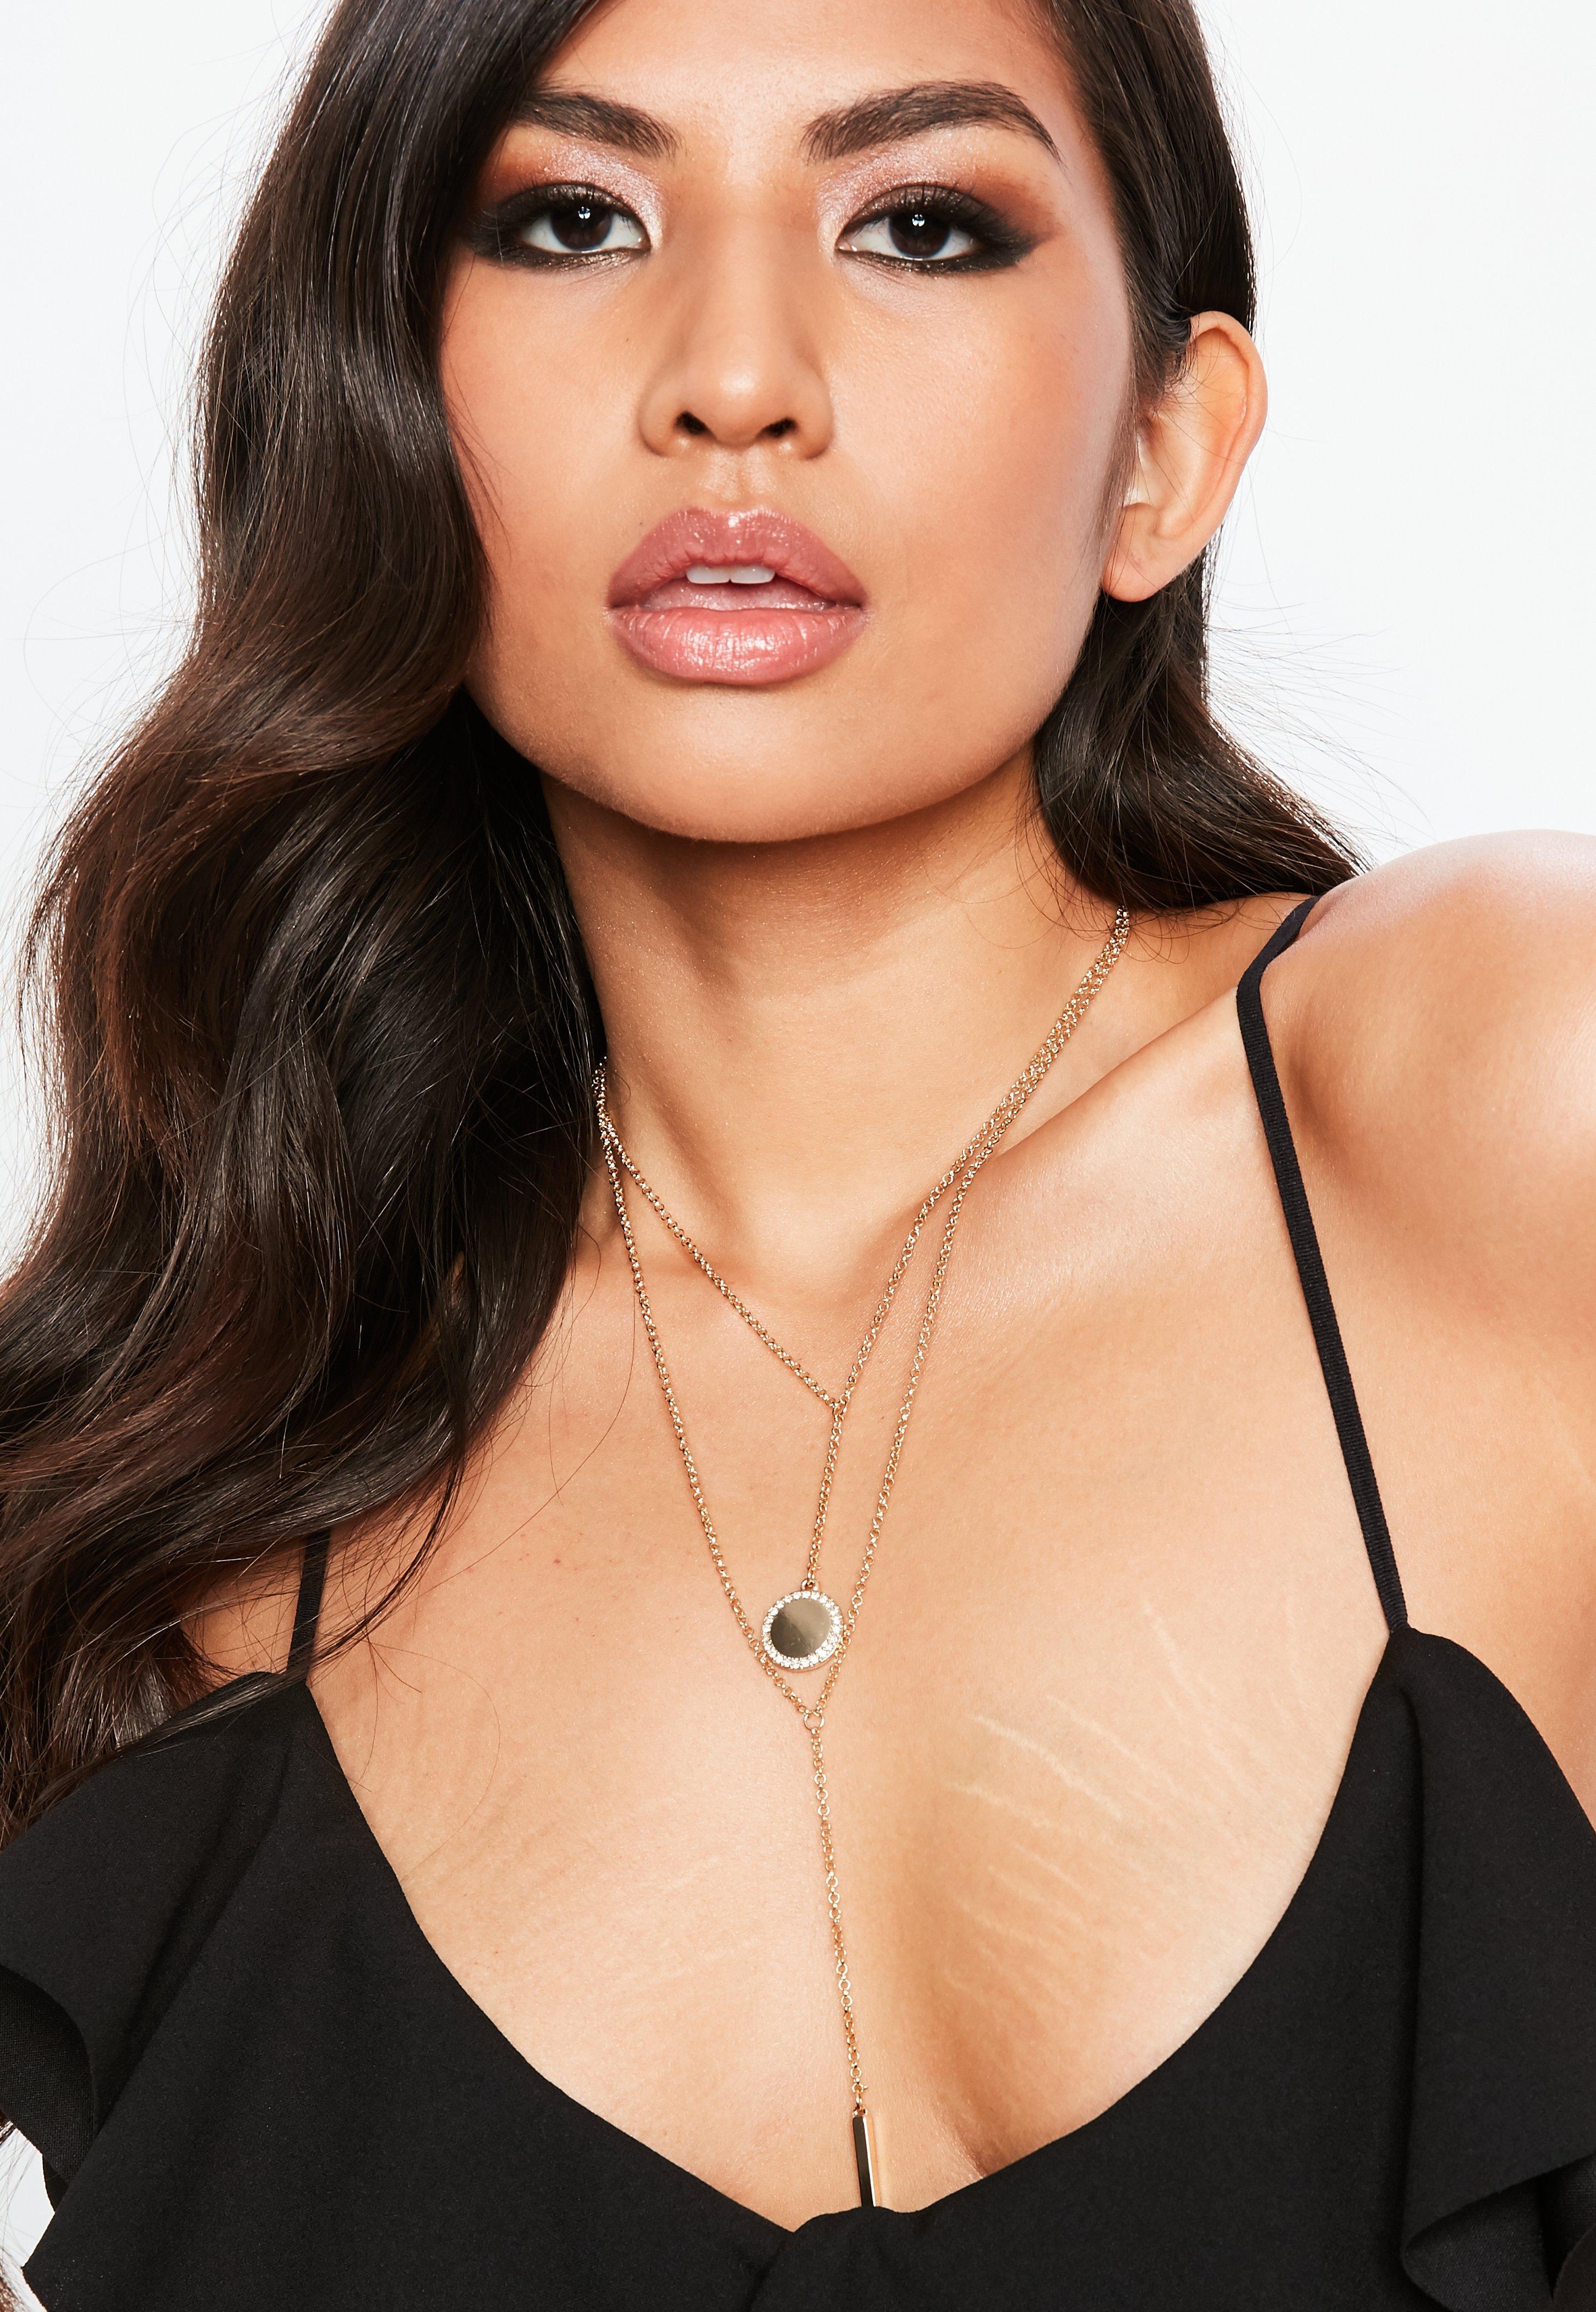 Jewelry - Women\'s Fashion & Costume Jewelry | Missguided